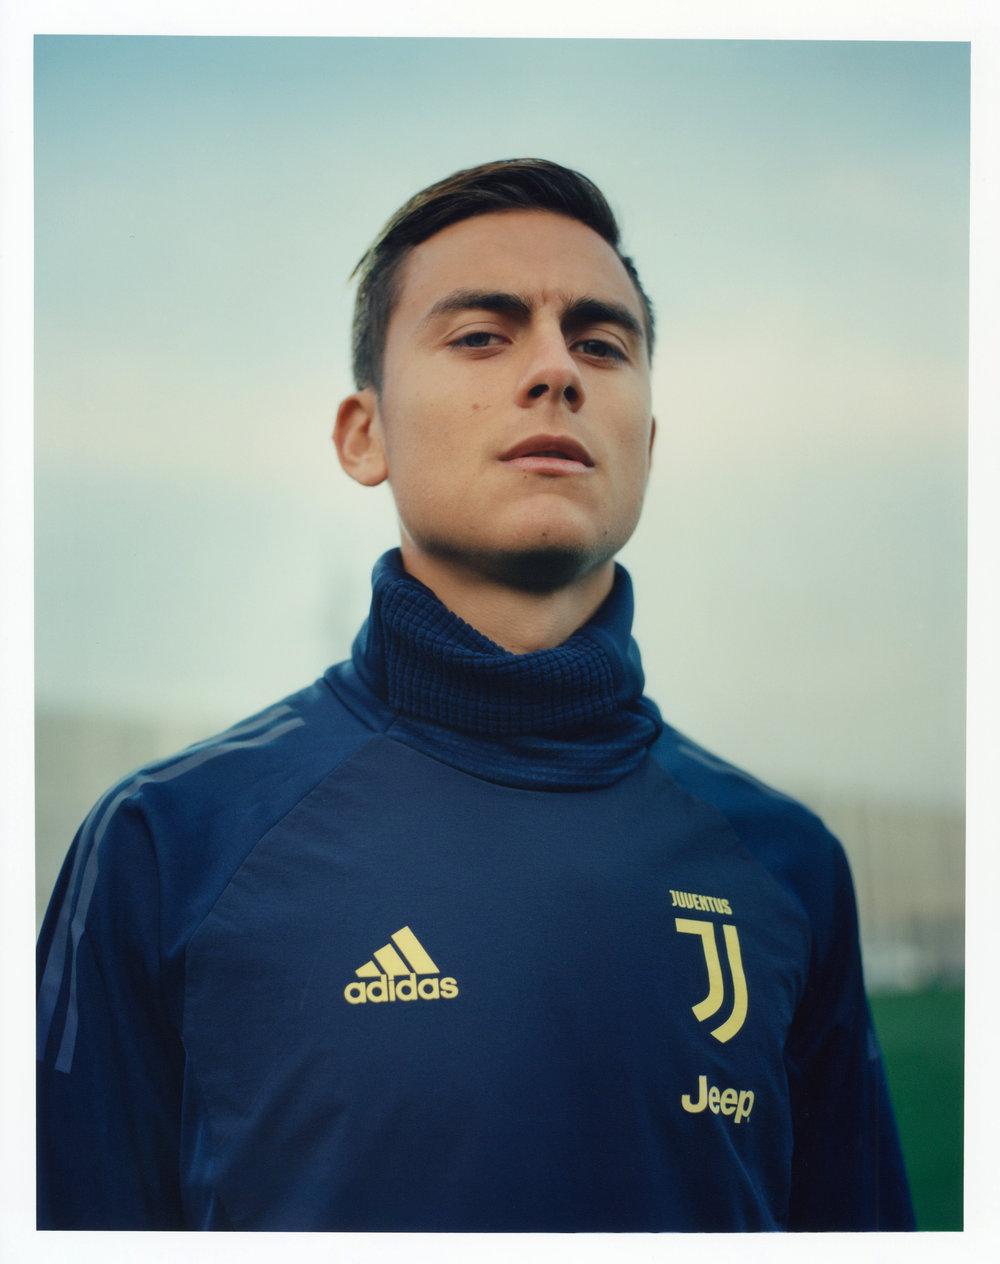 Paulo Dybala for Adidas